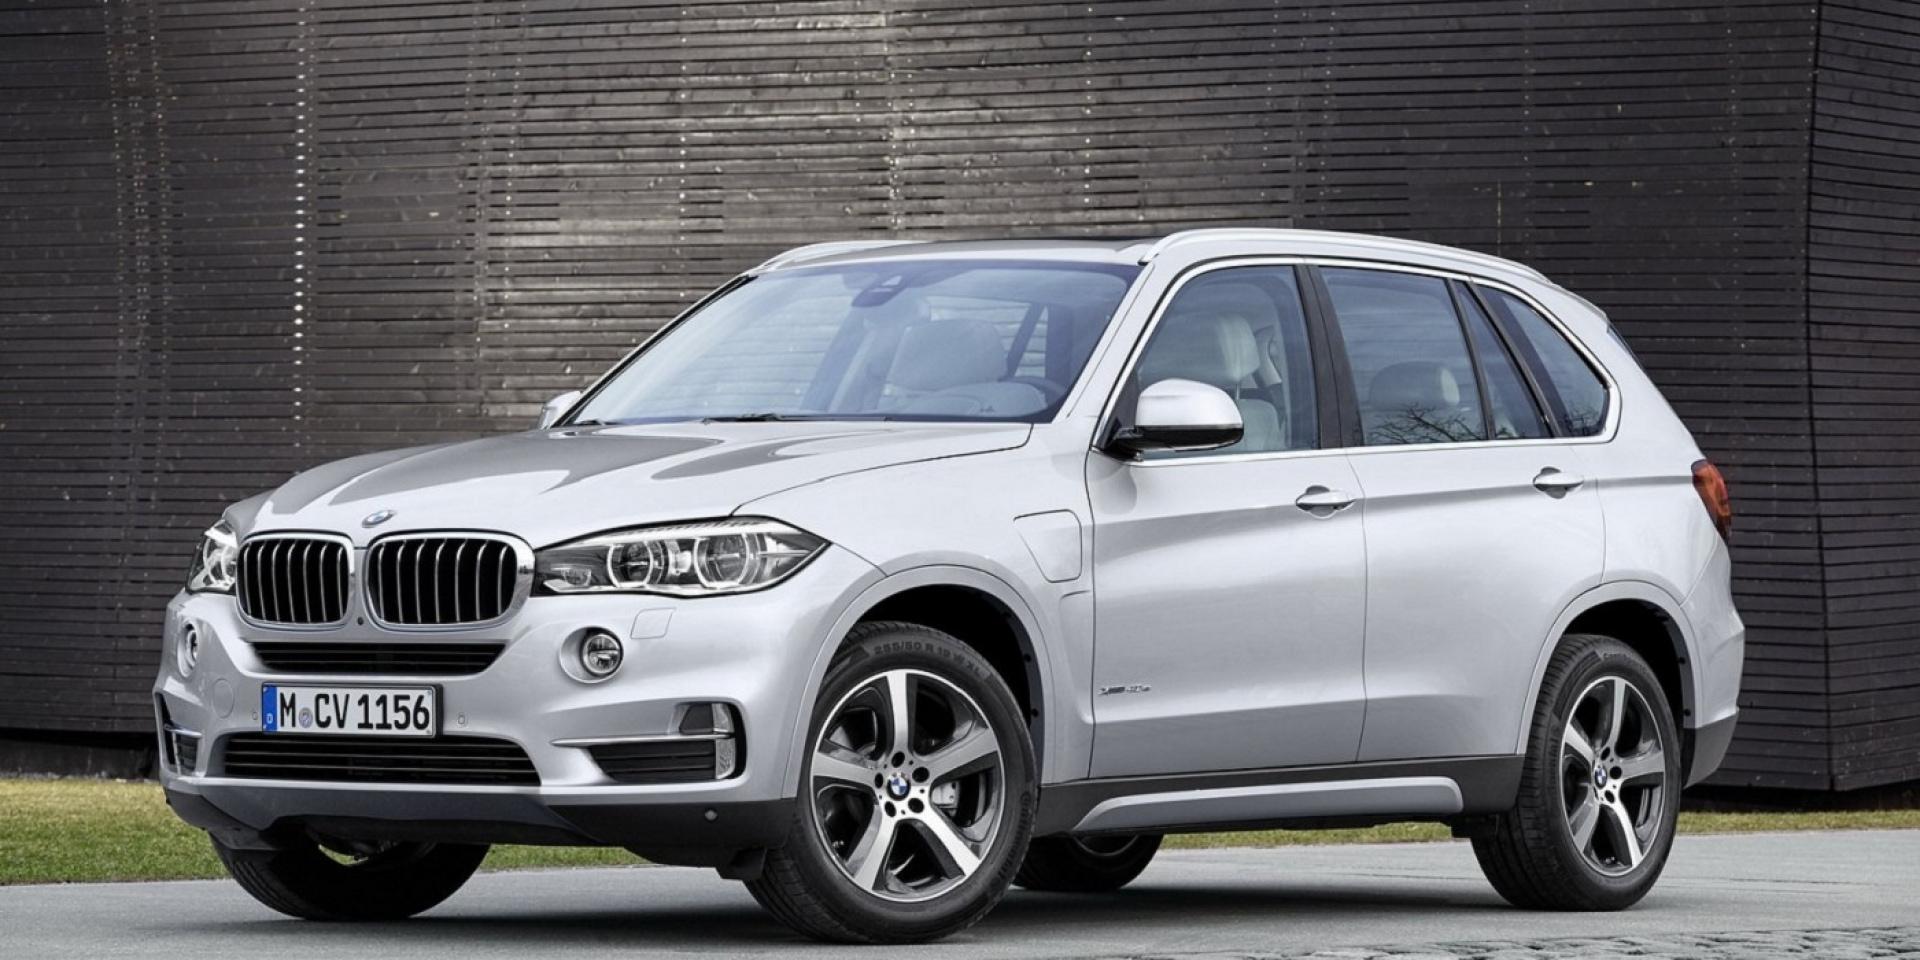 BMW將把部分X5轉移泰國生產銷售中國,台灣不受影響